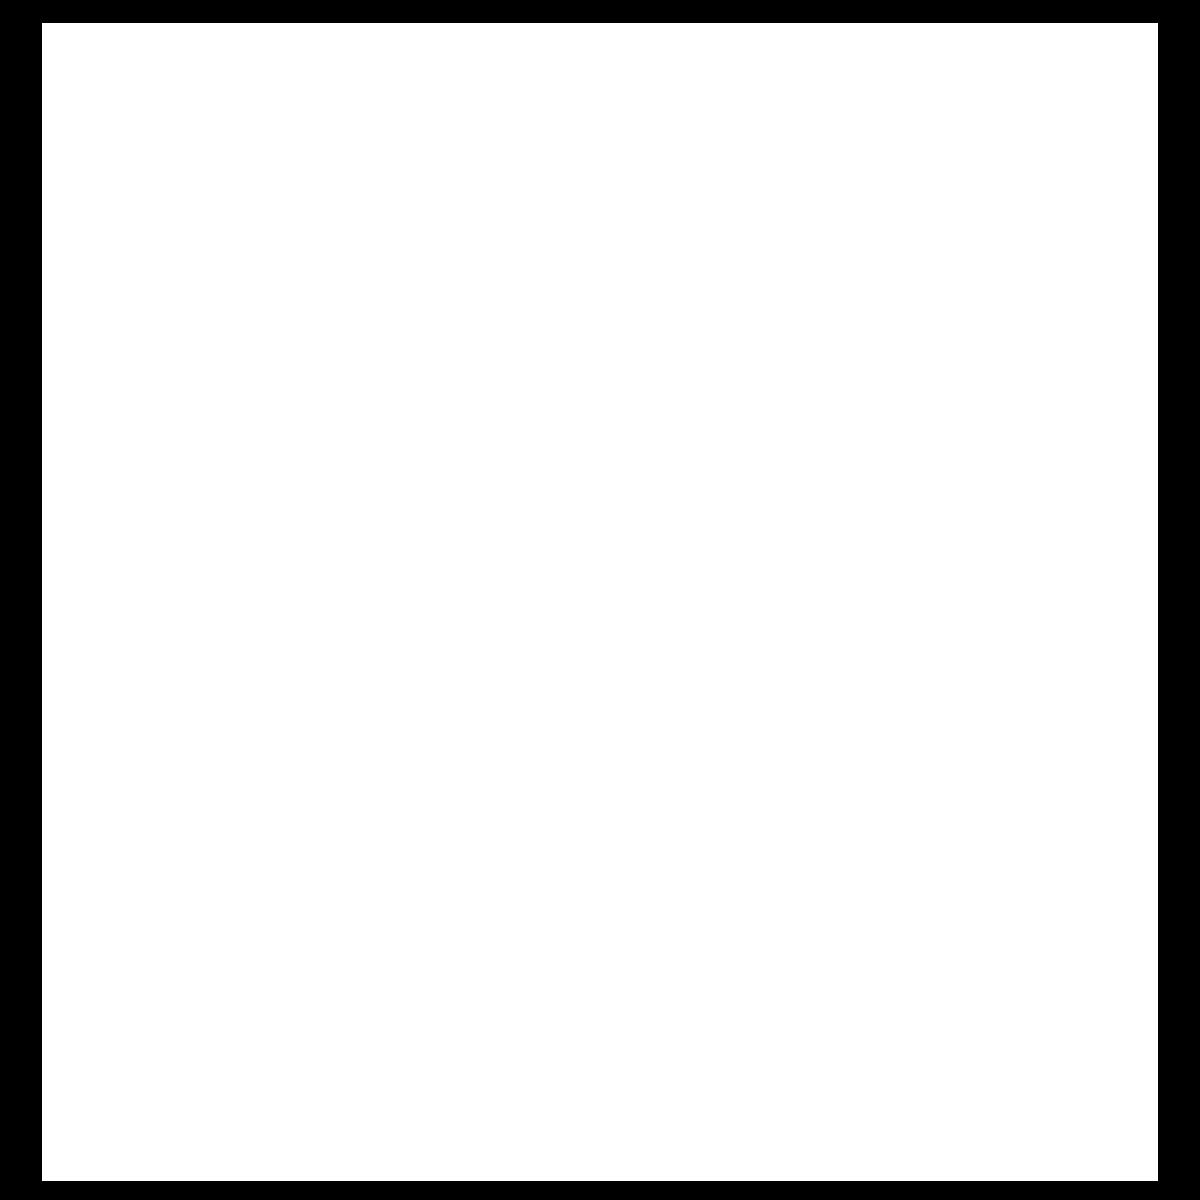 Lifes healing choices week 2 the hope choice mesilla park mesilla park community church las cruces buycottarizona Image collections